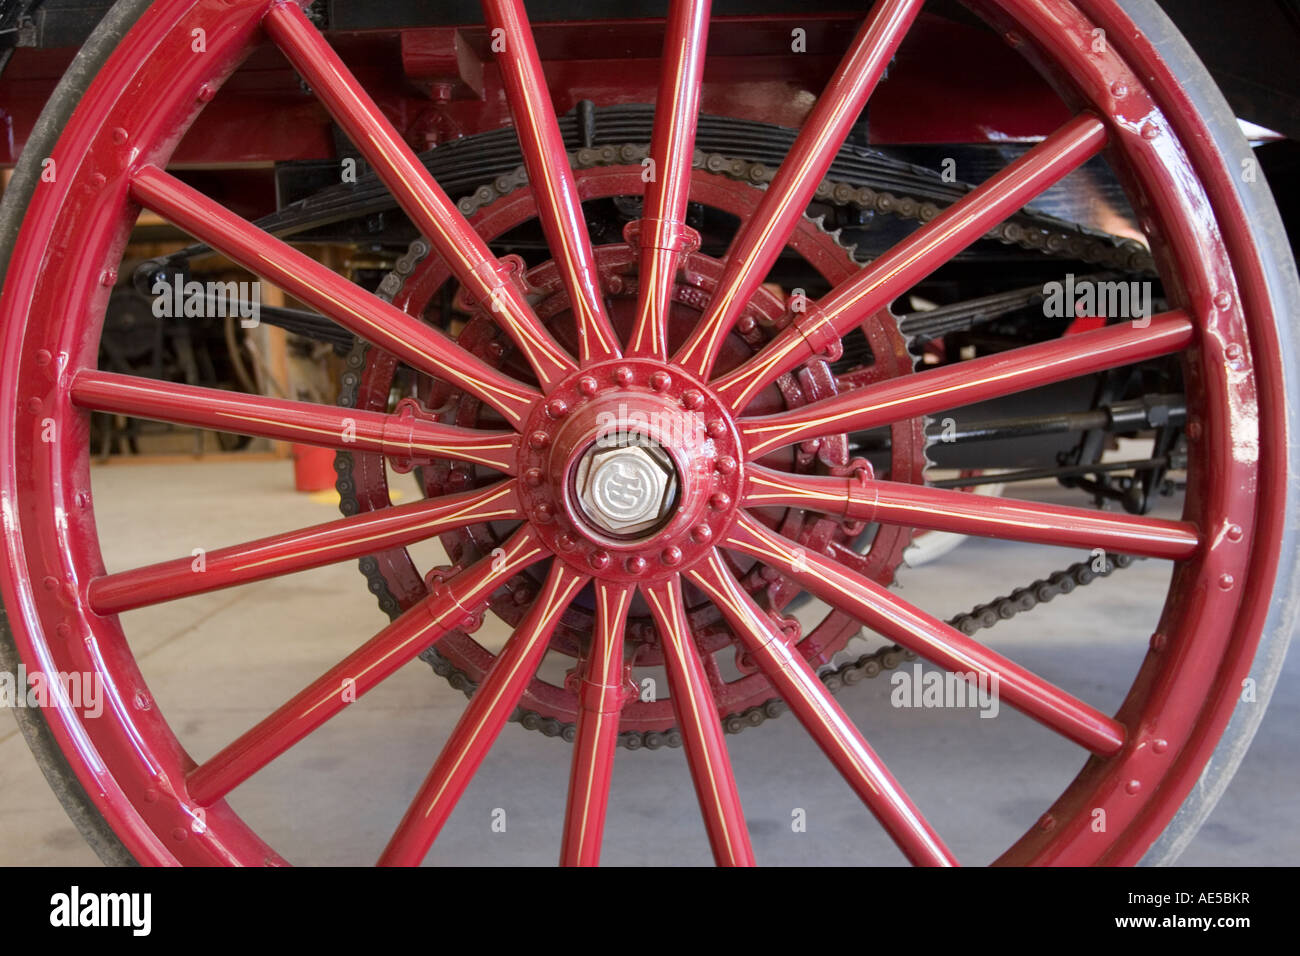 Spokes Wheel Stockfotos & Spokes Wheel Bilder - Alamy